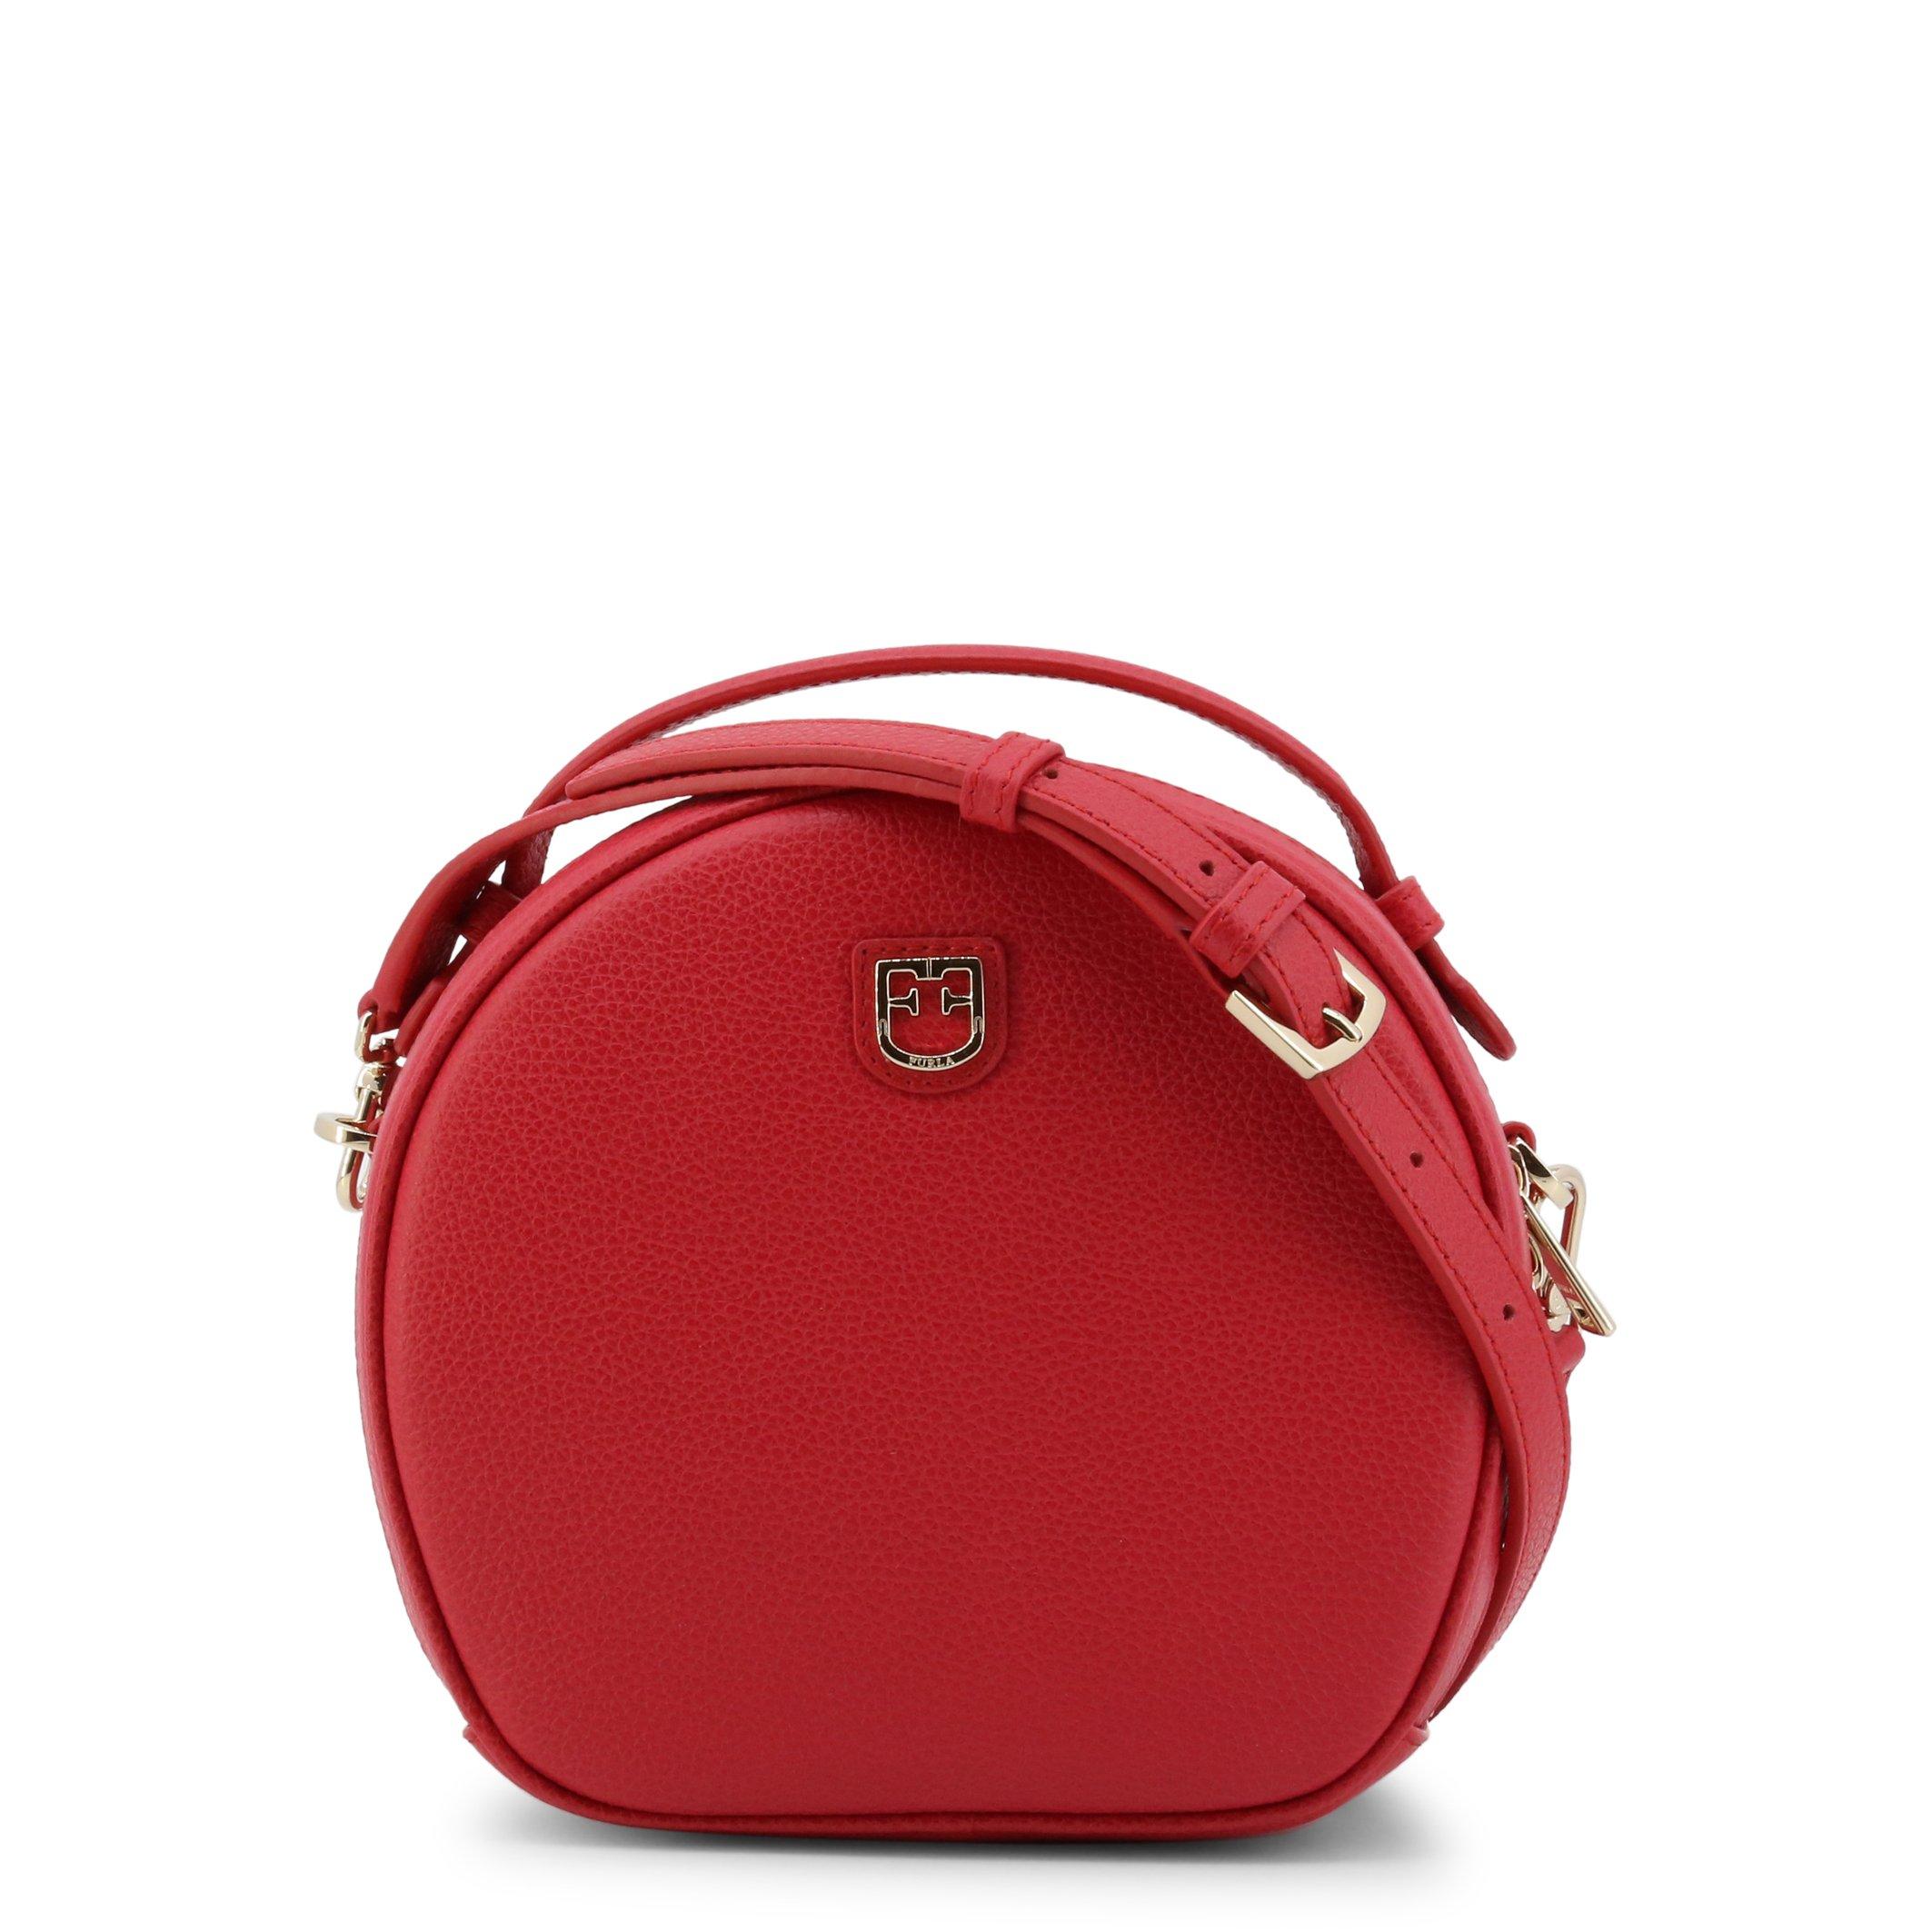 Furla Women's Handbag Various Colours DOTTY_WB00107 - red NOSIZE